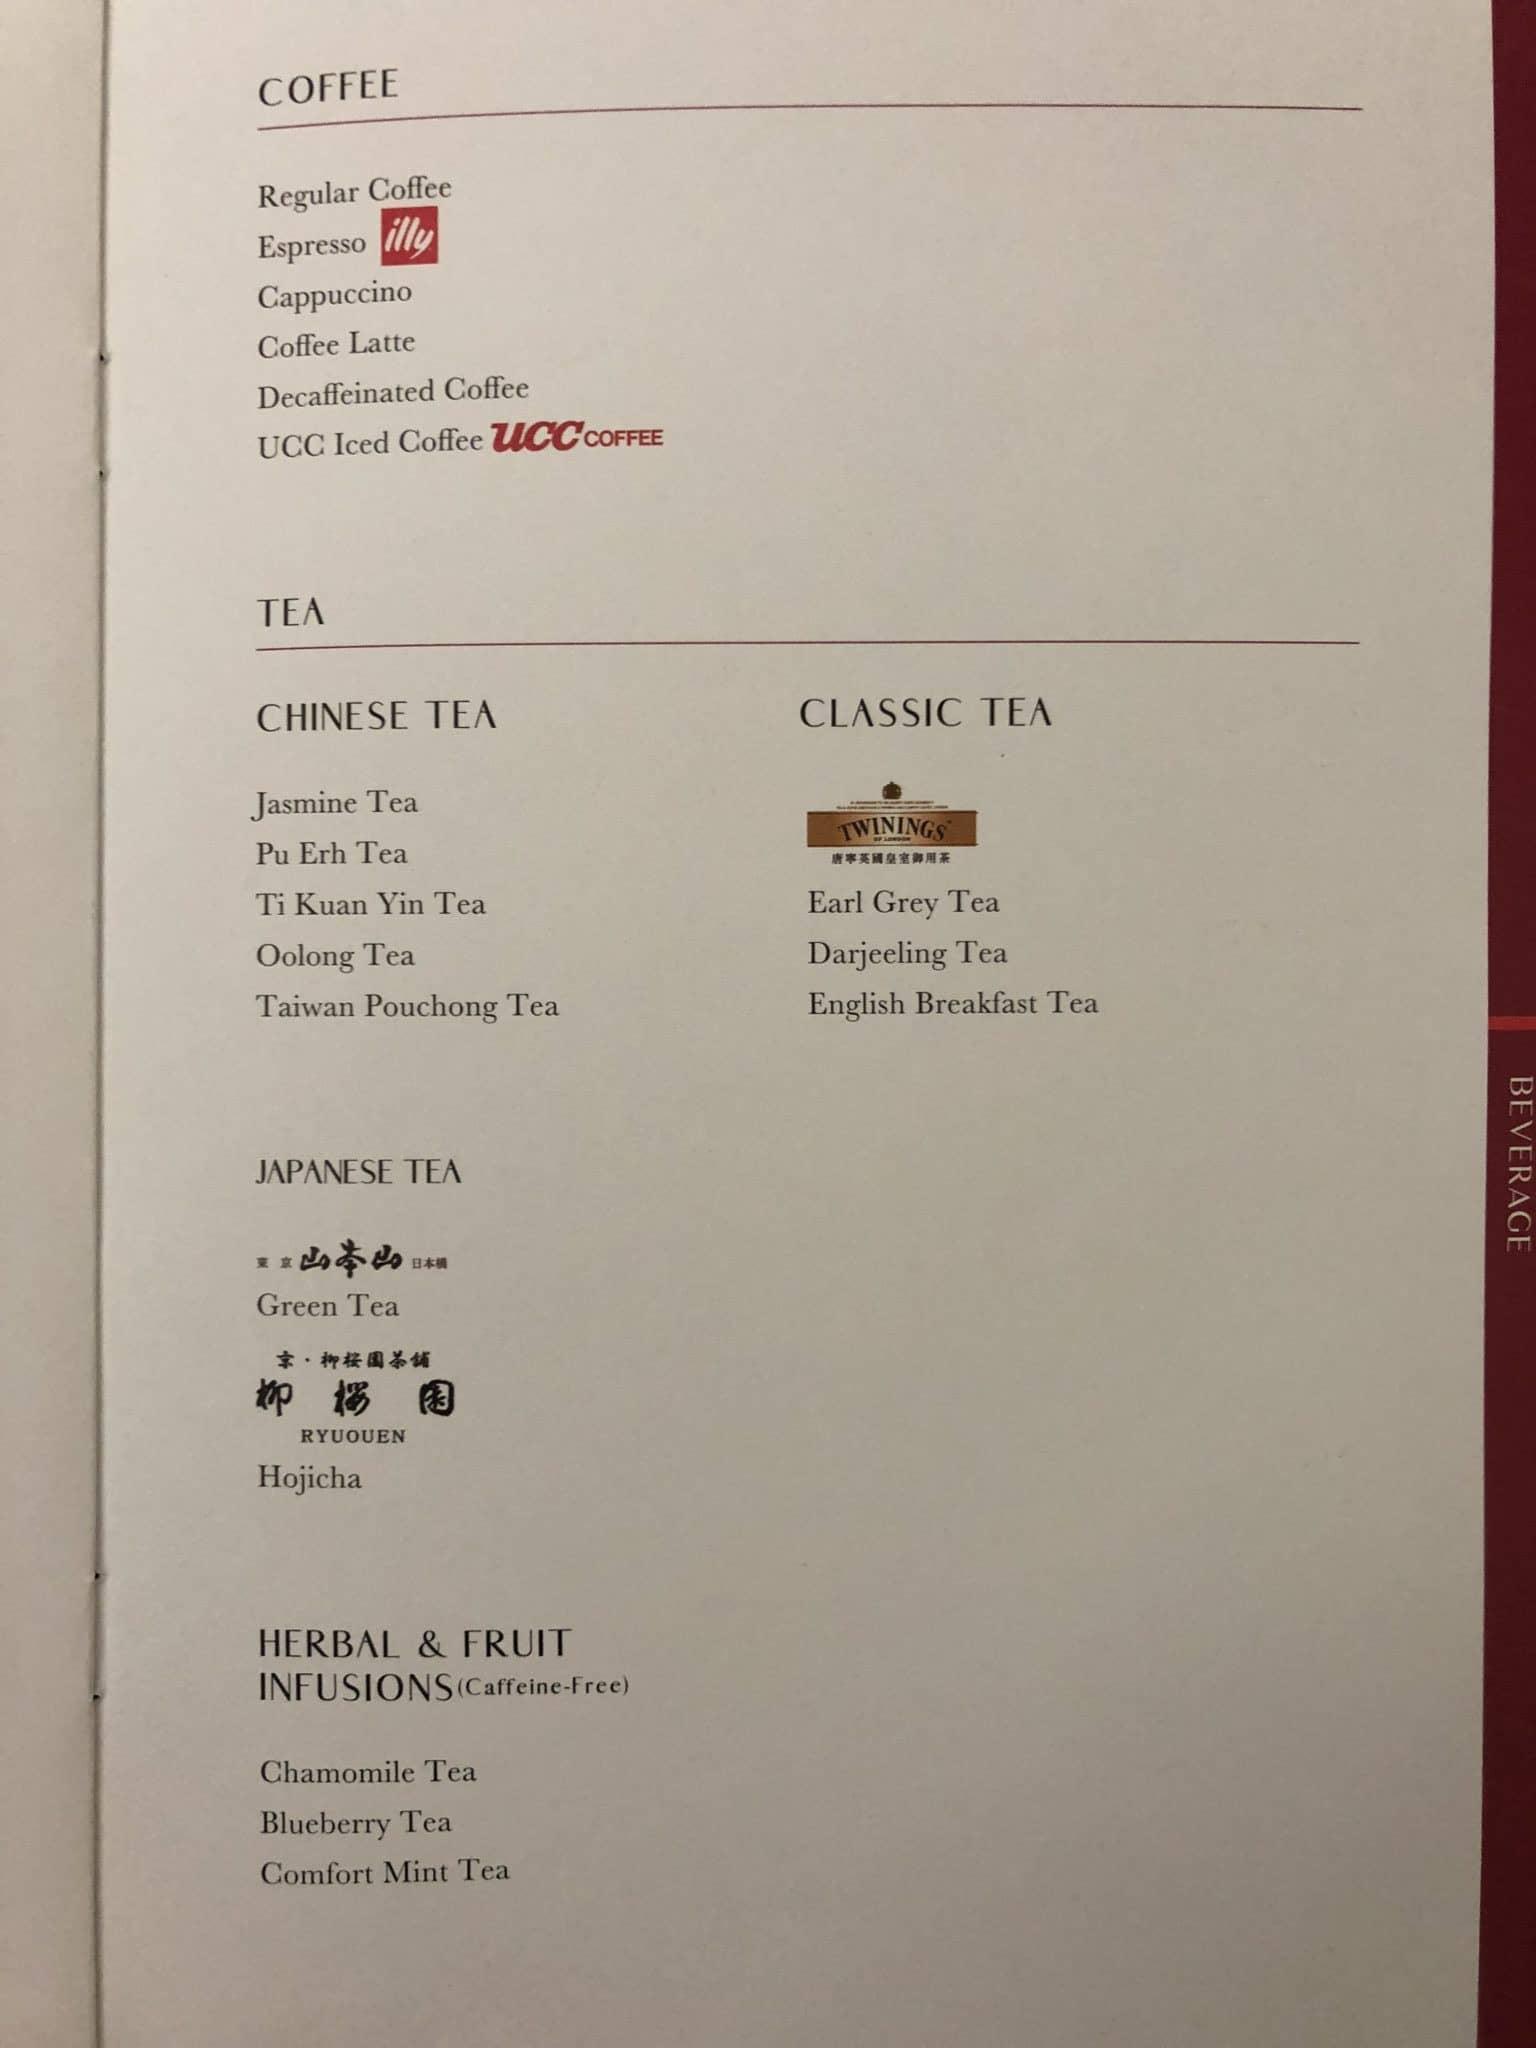 EVA Air Business Class Boeing 777-300 Kaffee und Tee